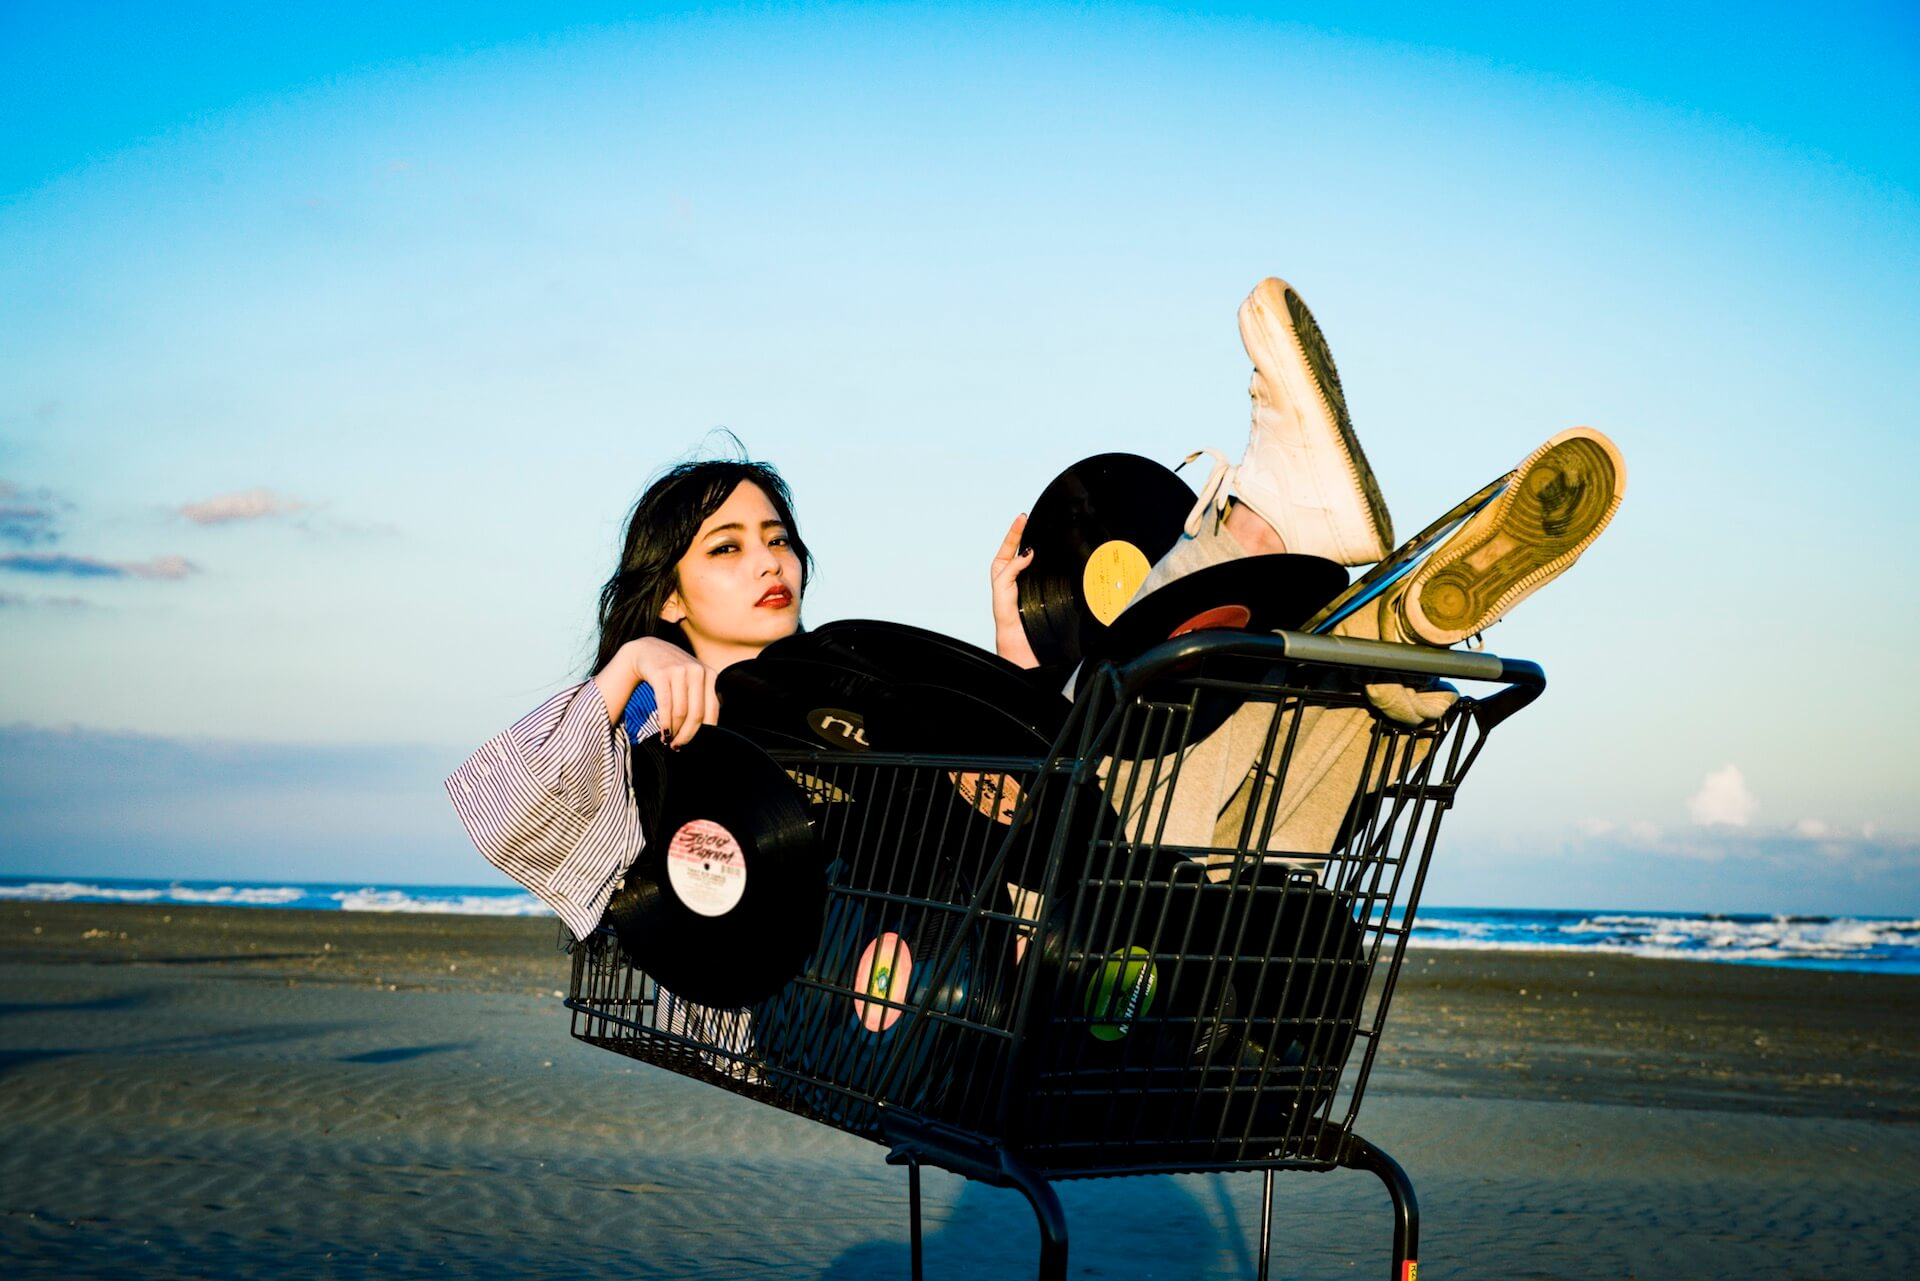 LIQUIDROOM15周年公演にnever young beach×七尾旅人、クラムボン『JP』完全再現、追加でCompuma、Licaxxxらが発表 music190626-liquidroom15th-3